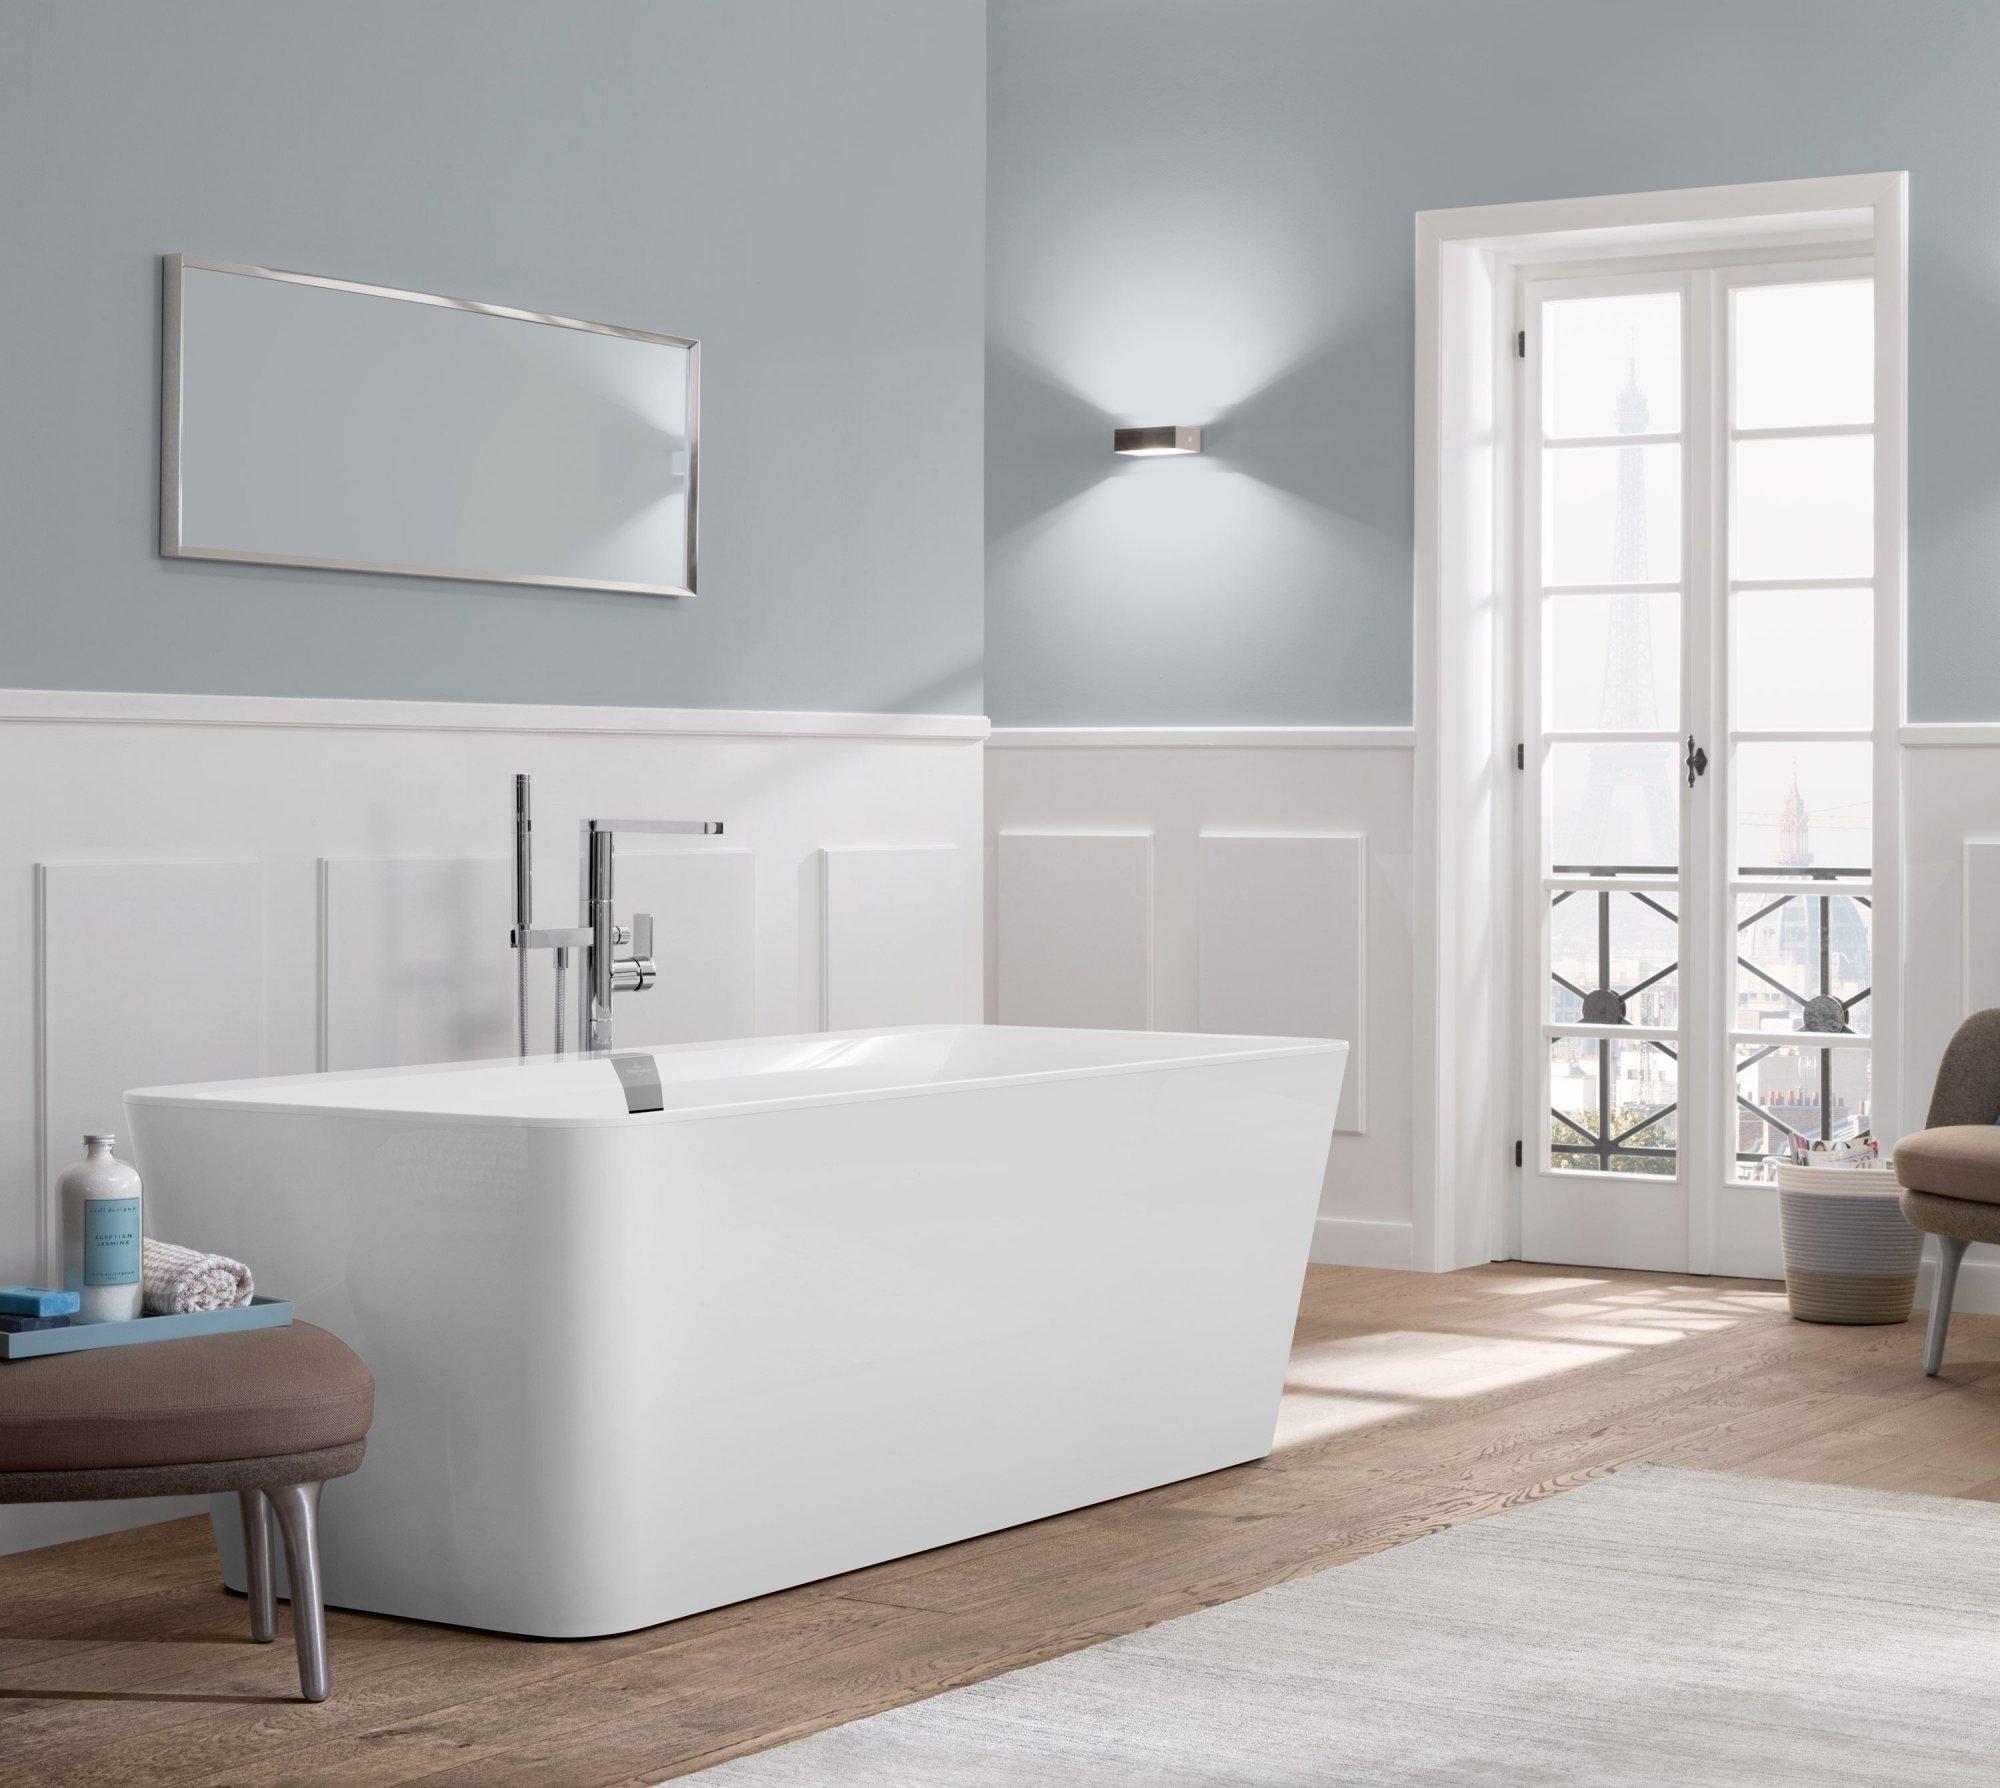 west one bathrooms squaro edge 12 villeroyboch lifestyle white  3000×2682